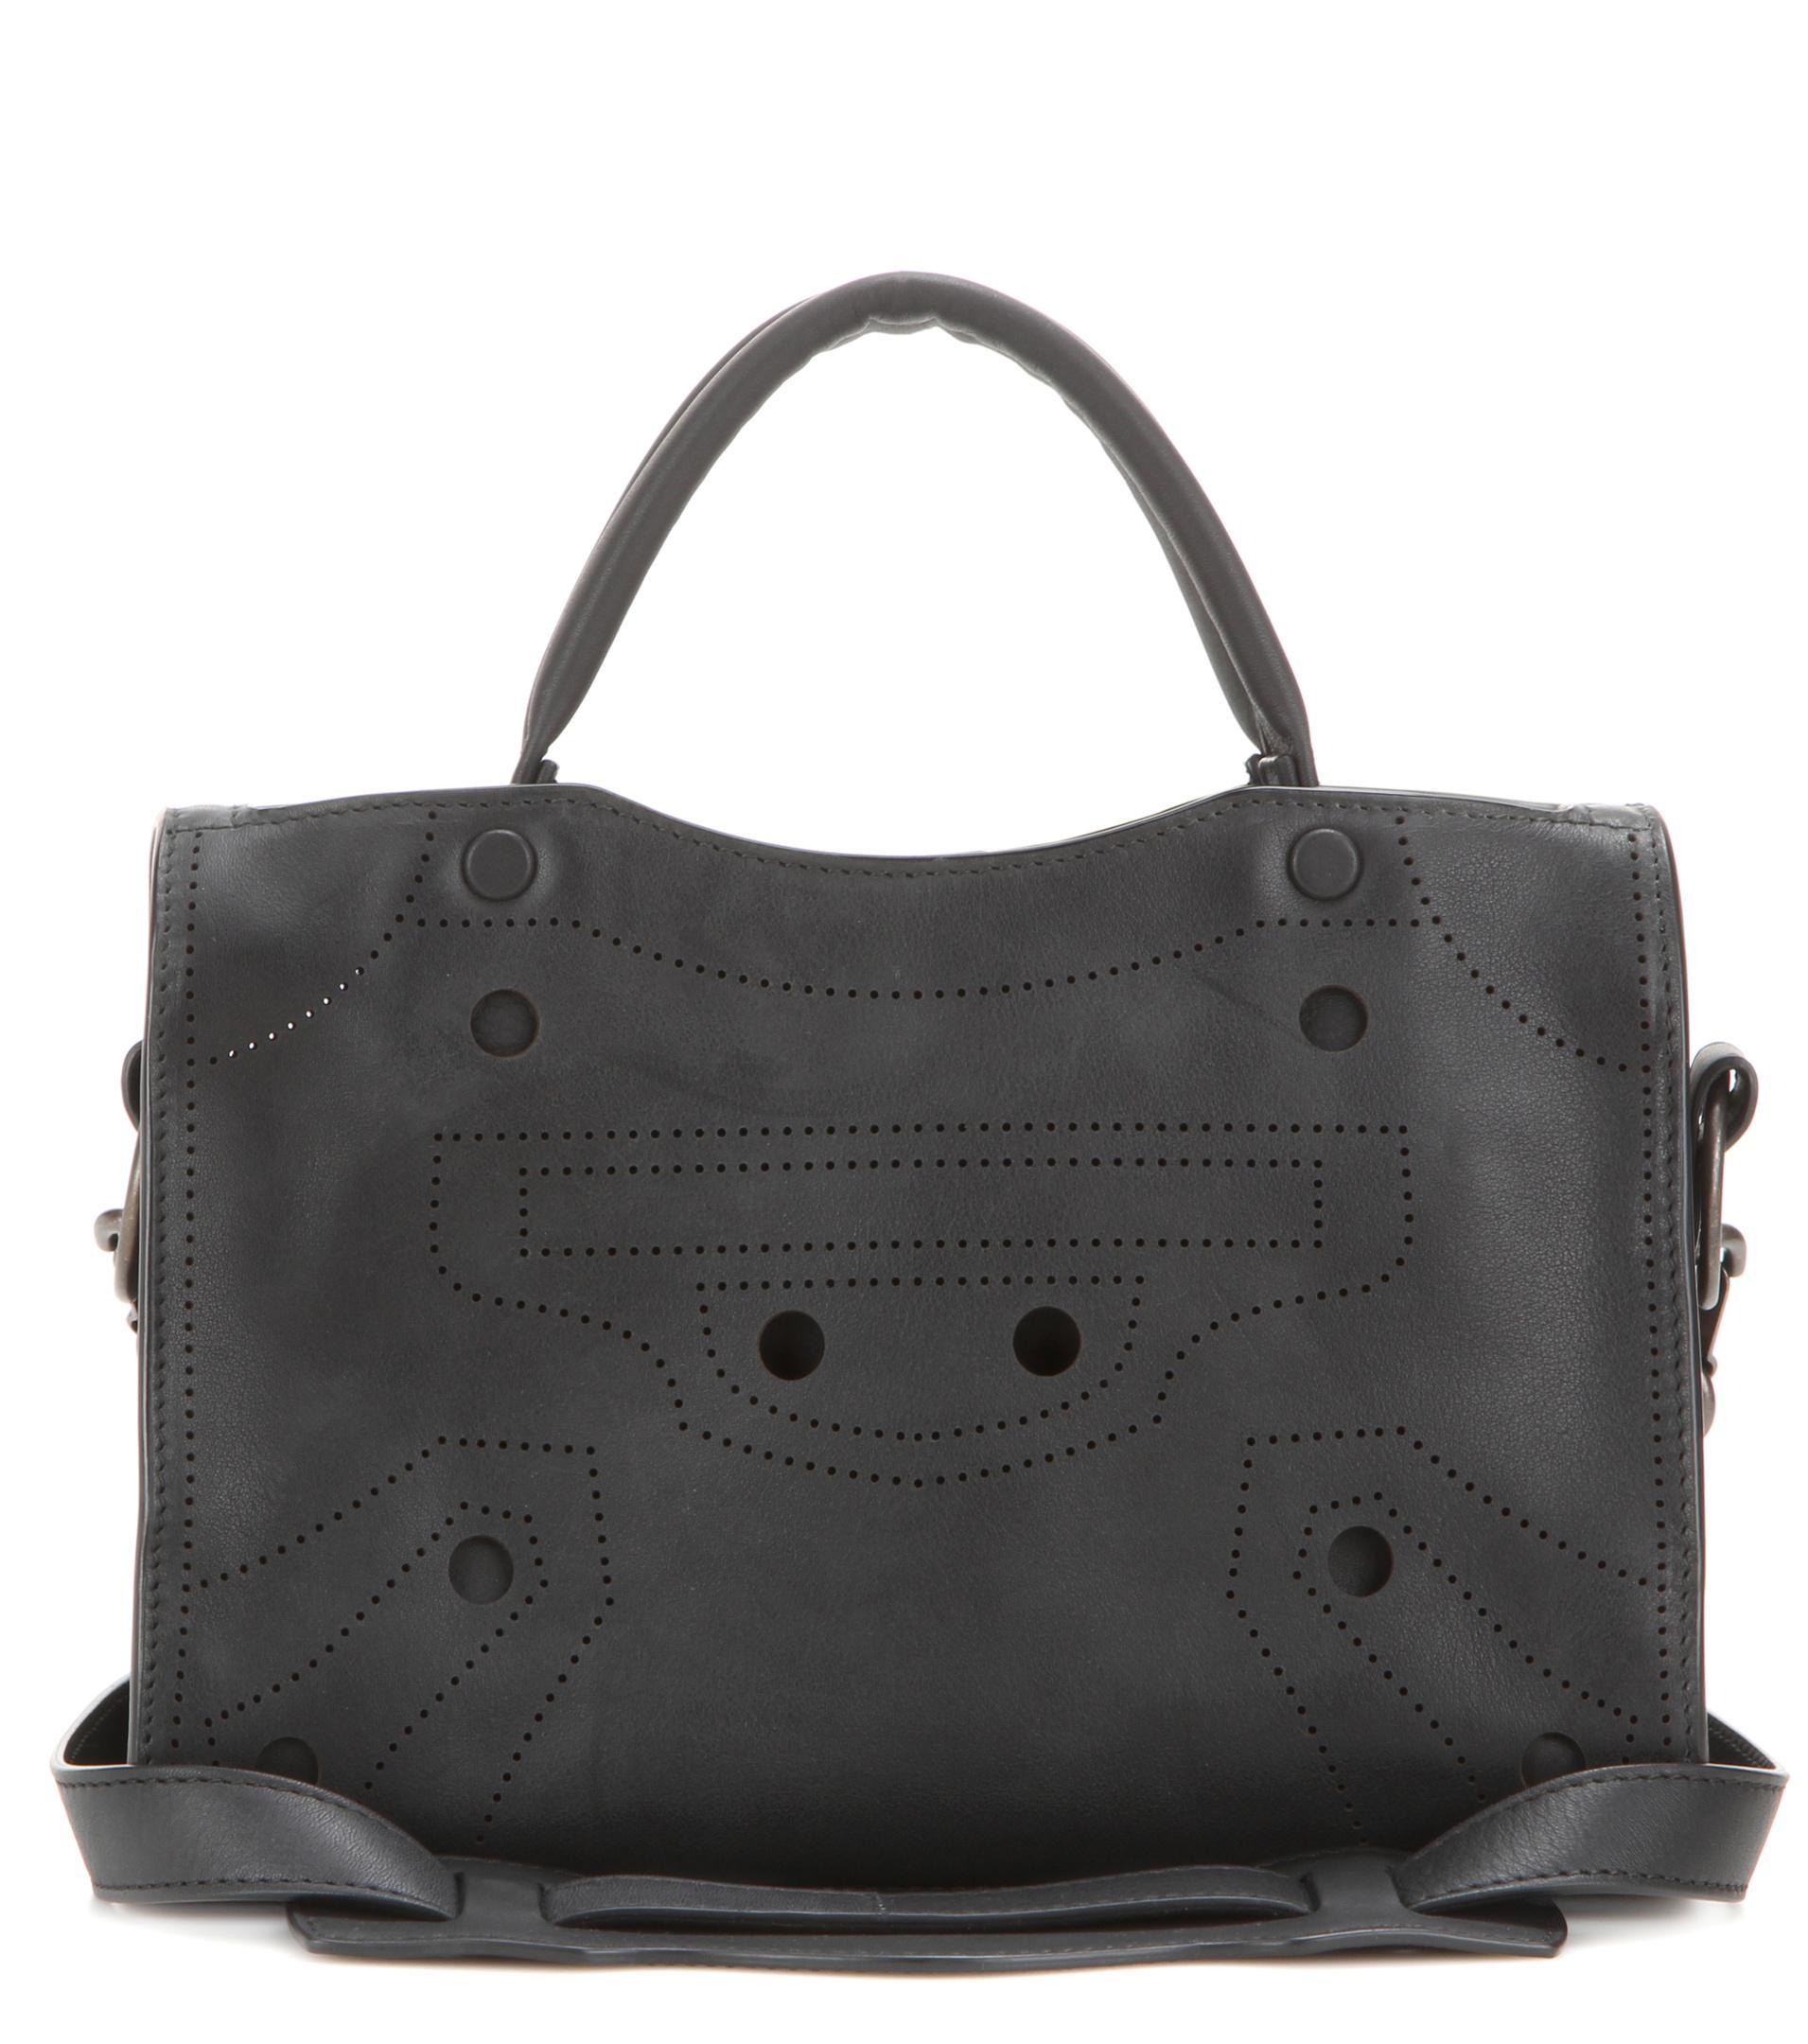 b736a040555 Balenciaga Blackout City Mini Leather Cross-body Bag in Black - Lyst